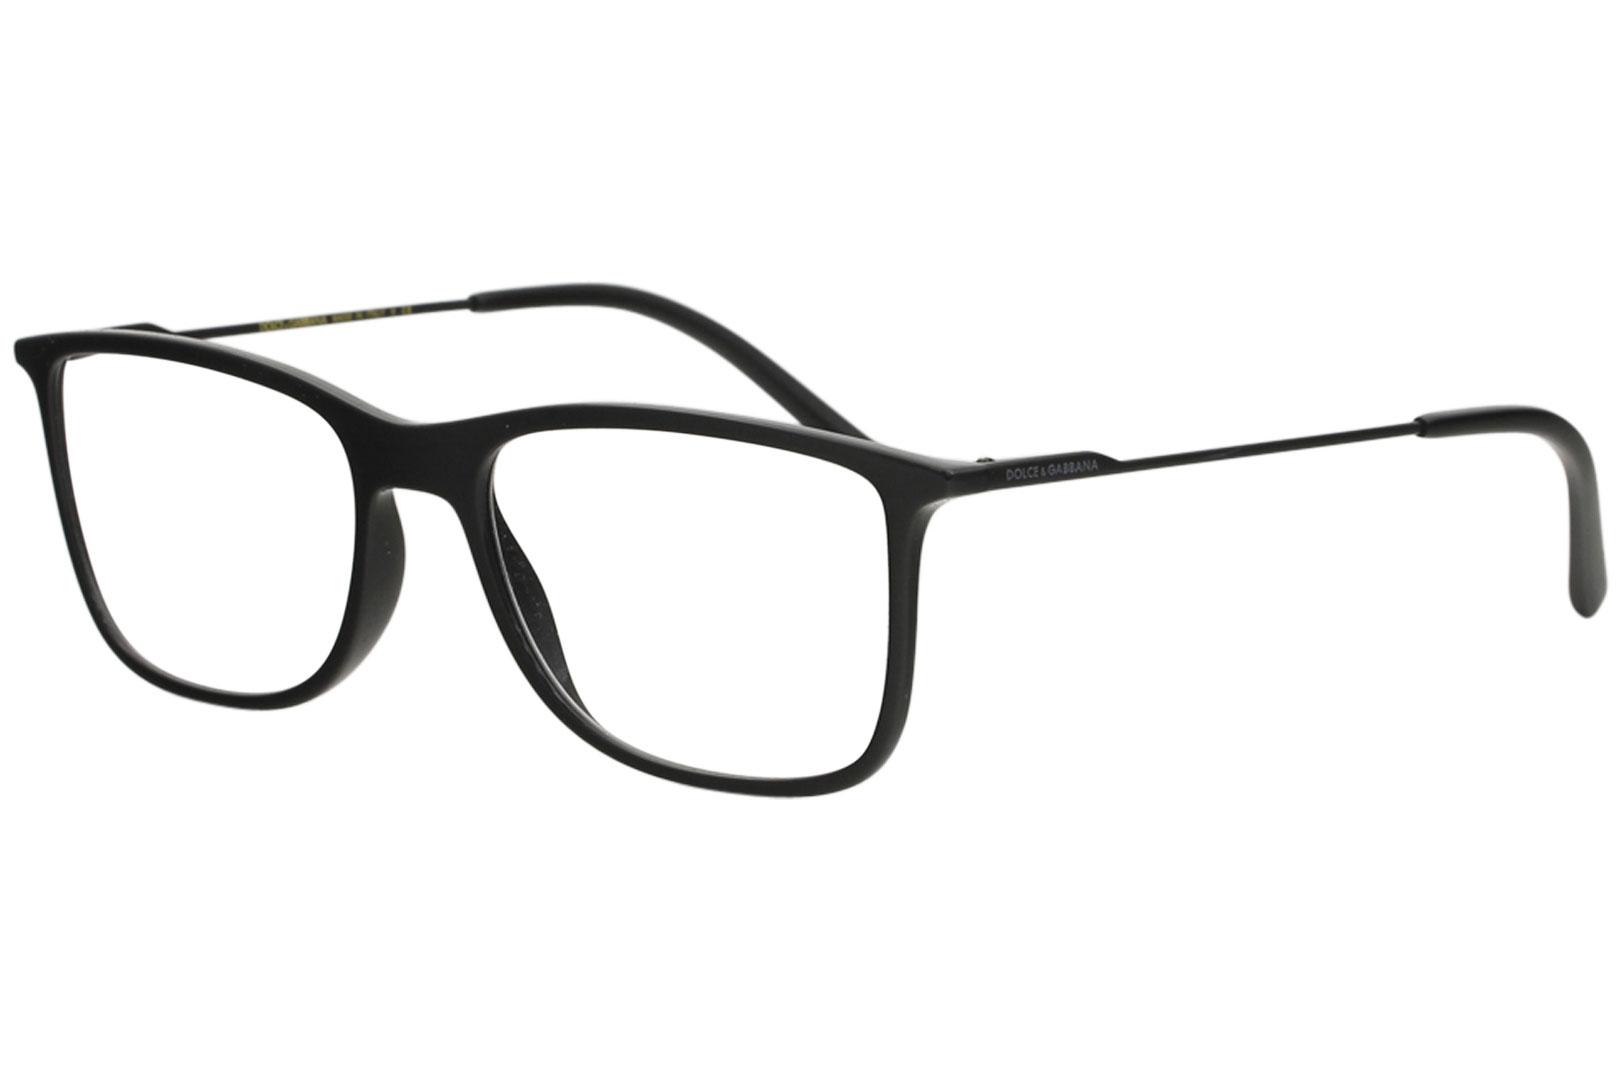 669c5071dec Details about Dolce   Gabbana Men s Eyeglasses D G DG5024 DG 5024 501 Black  Optical Frame 55mm